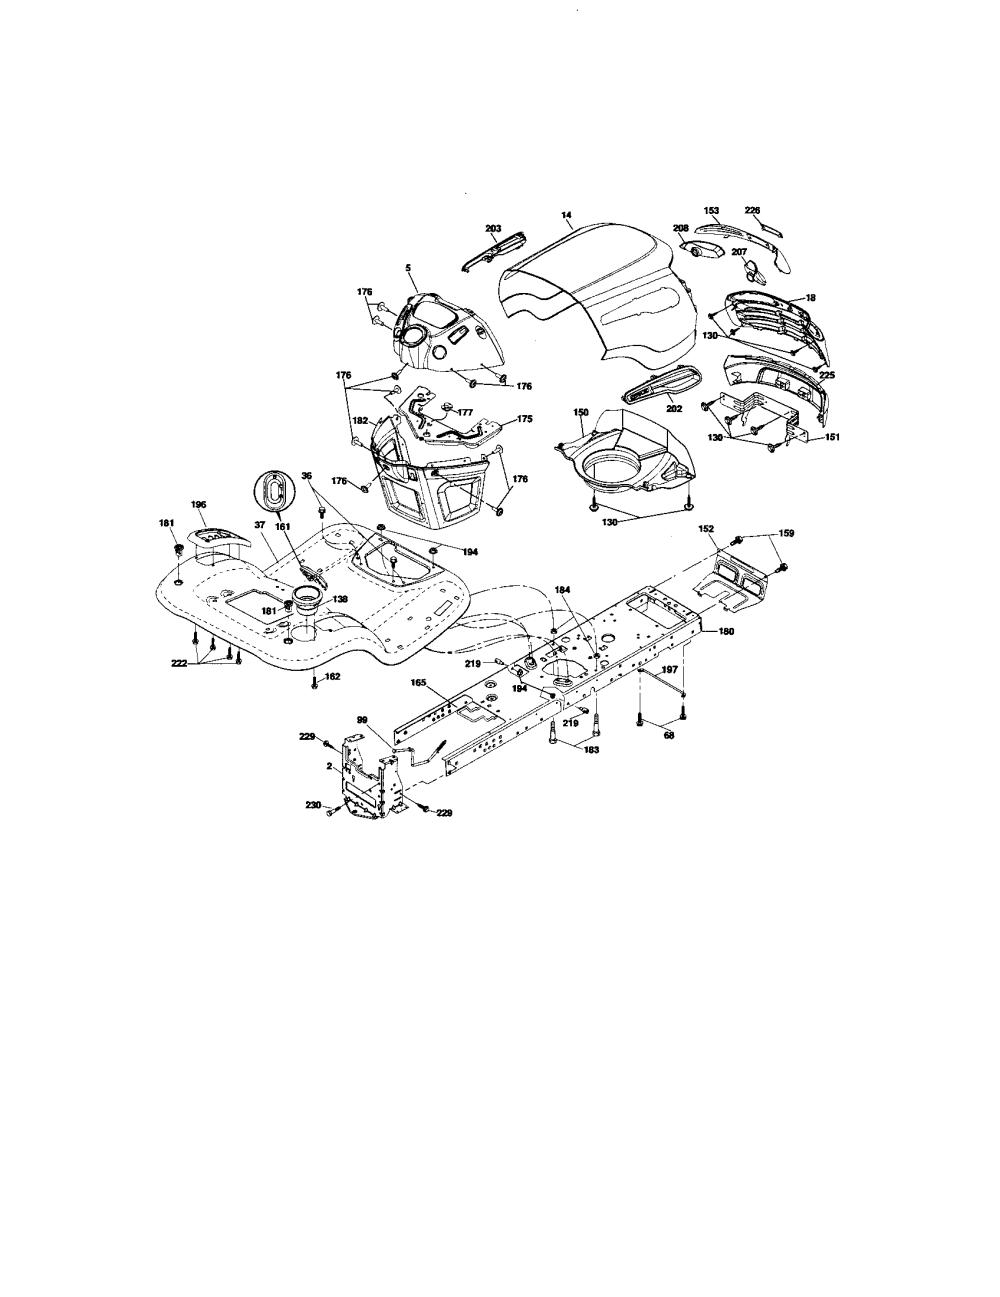 medium resolution of craftsman 917276600 chassis and enclosures diagram